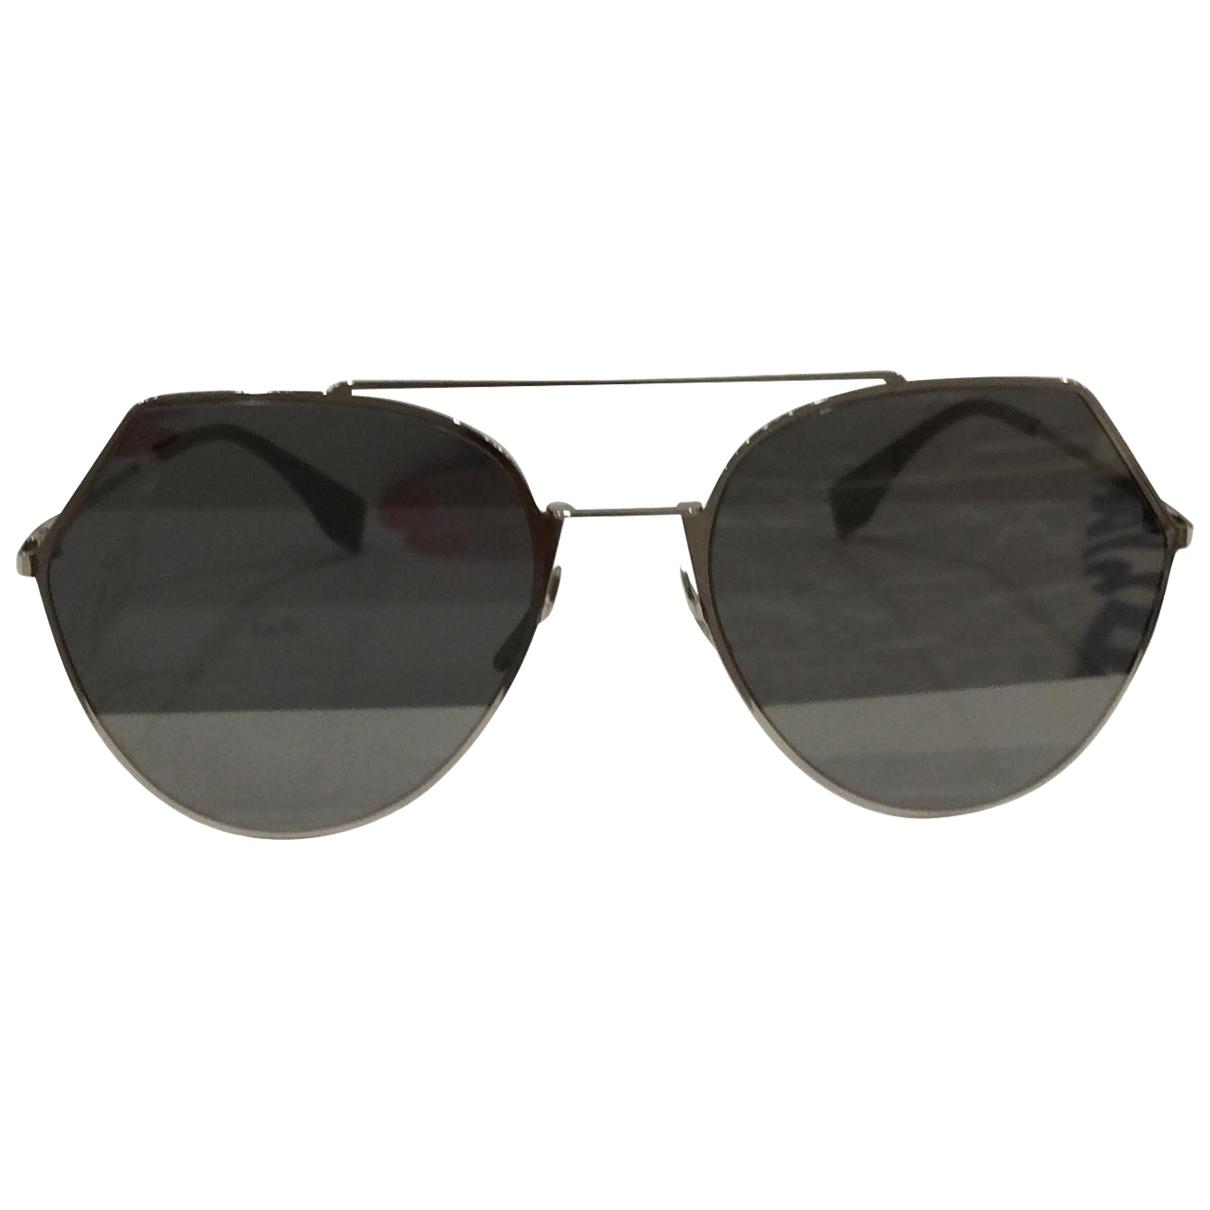 Fendi N Silver Metal Sunglasses for Women N